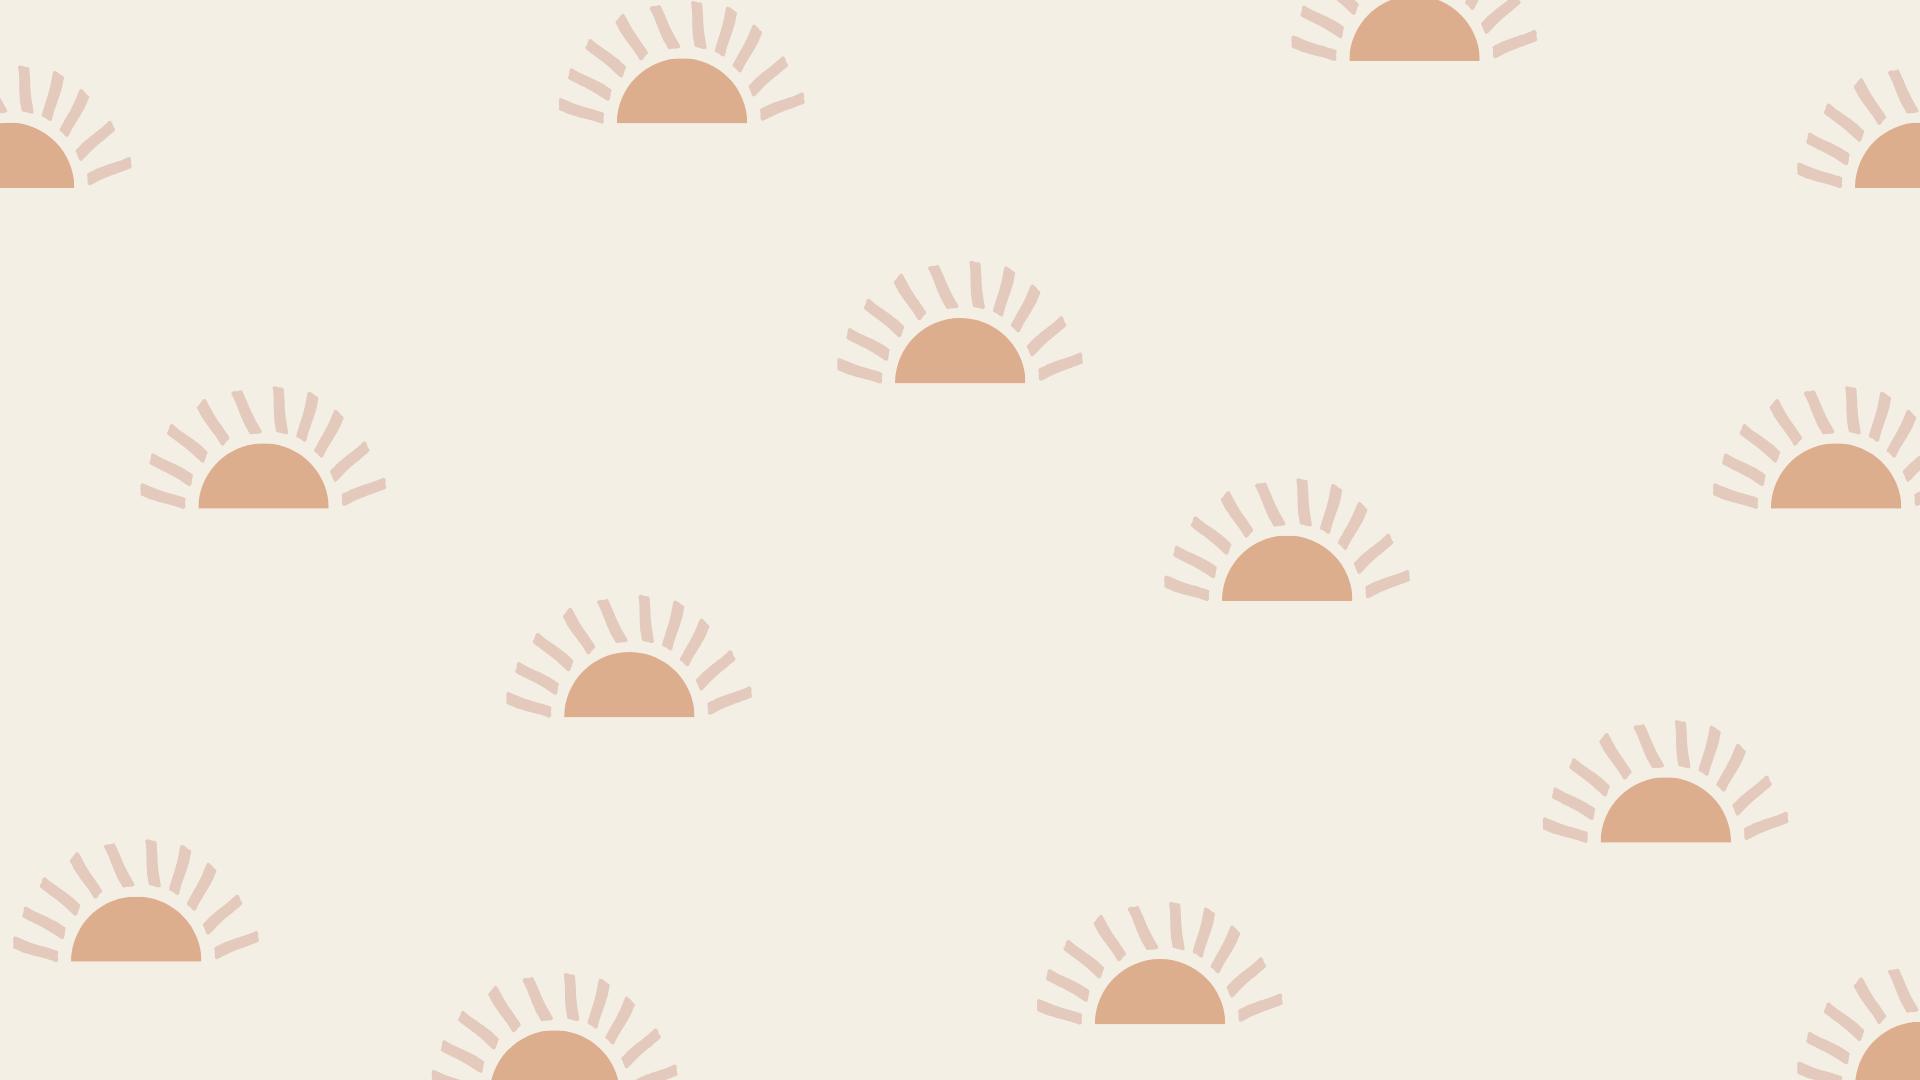 20 Boho Desktop Wallpapers Pink Digital Wallpapers Digital Laptop Backgrounds Pastel Positivity Wallpaper Designs Cute Desktop Wallpaper Computer Wallpaper Desktop Wallpapers Desktop Wallpaper Art